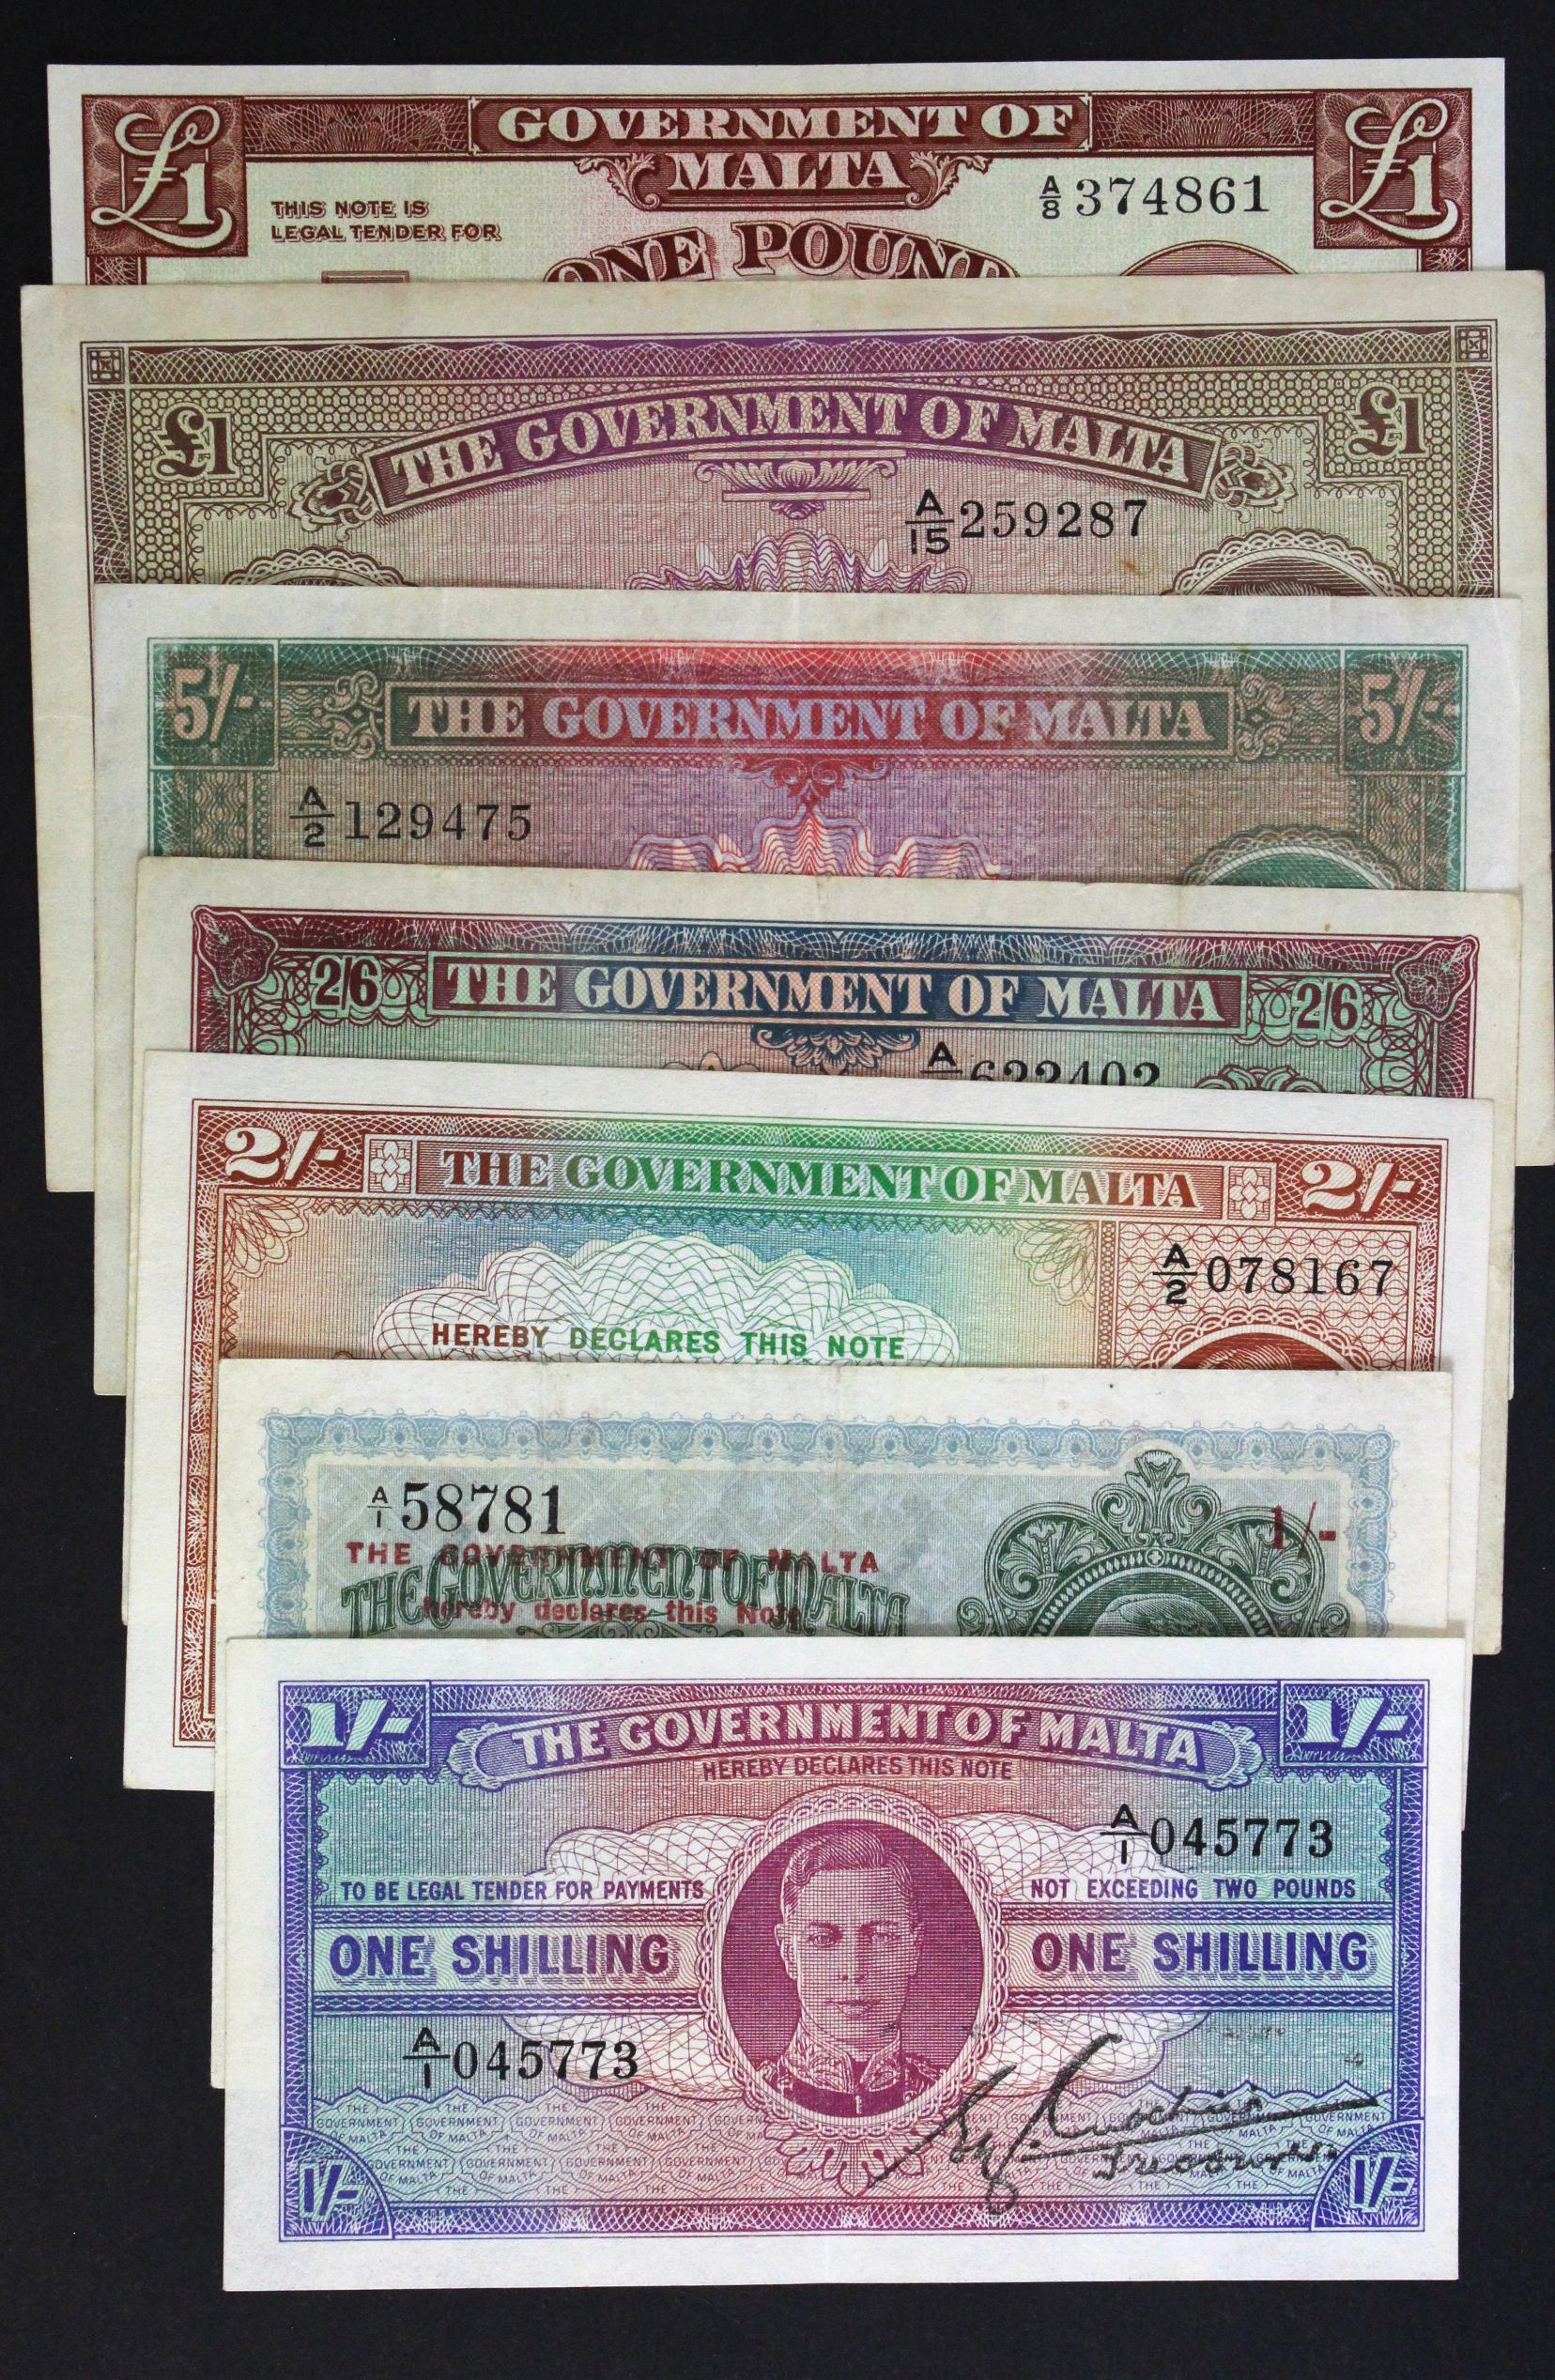 Malta (7), King George V and King George VI group, 1 Shilling overprint on 2 Shillings dated 1918 (